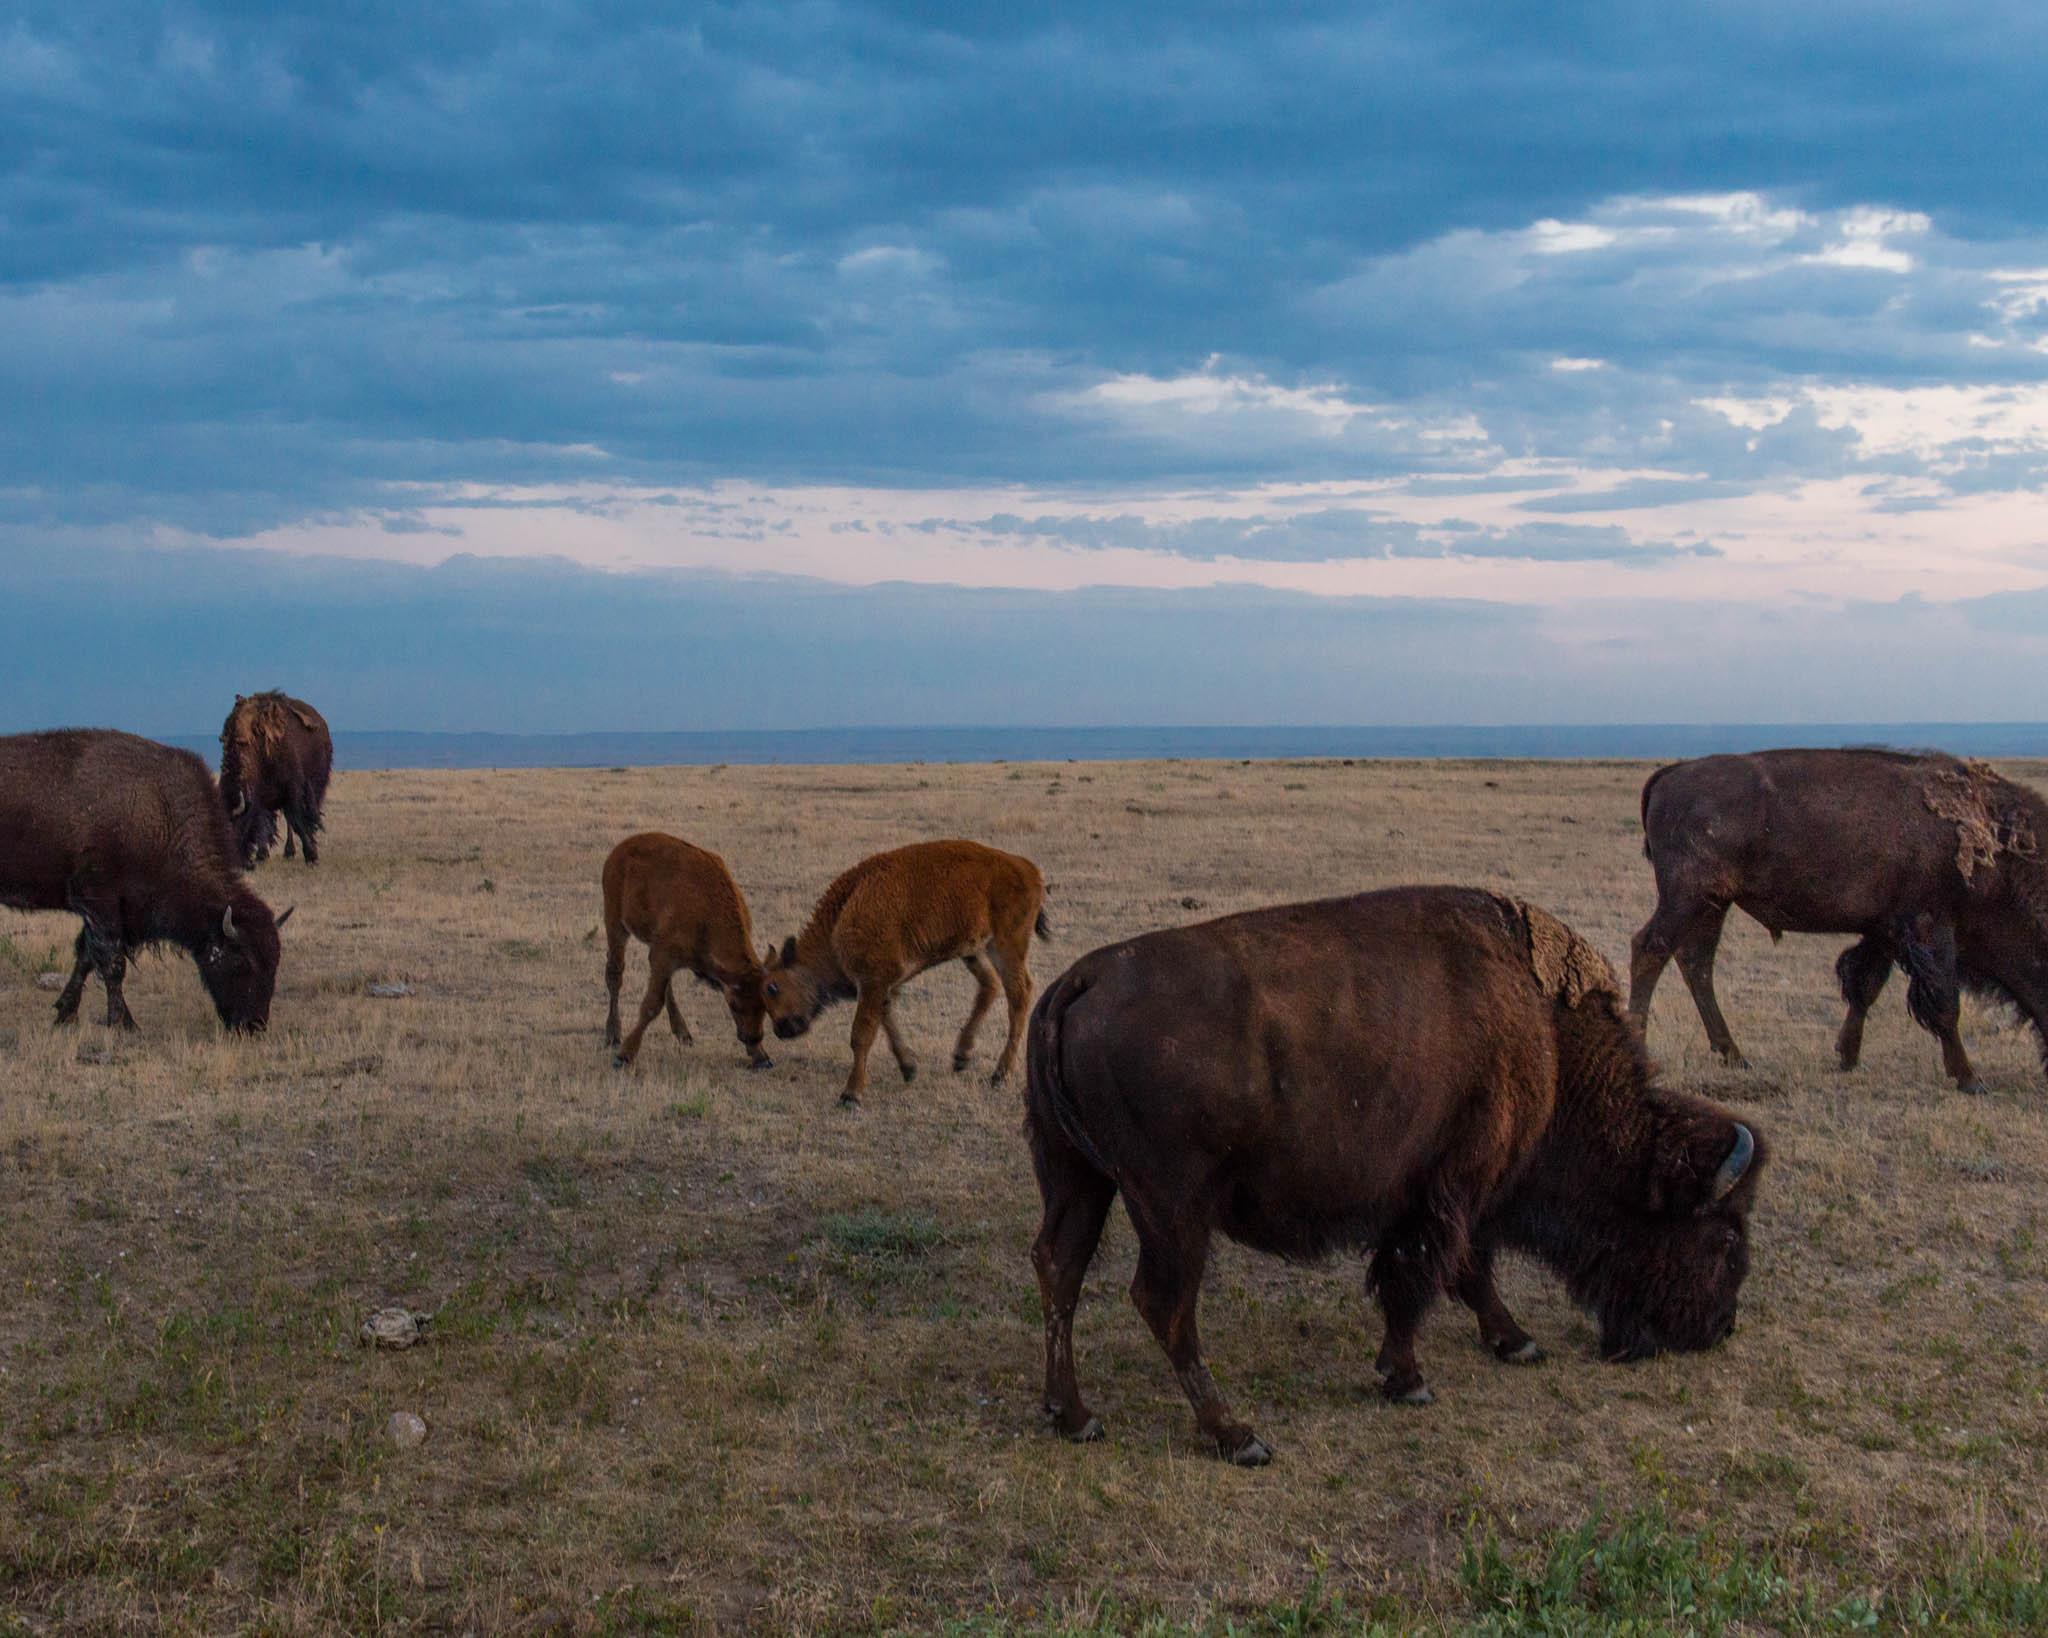 Bison calves horsing around!